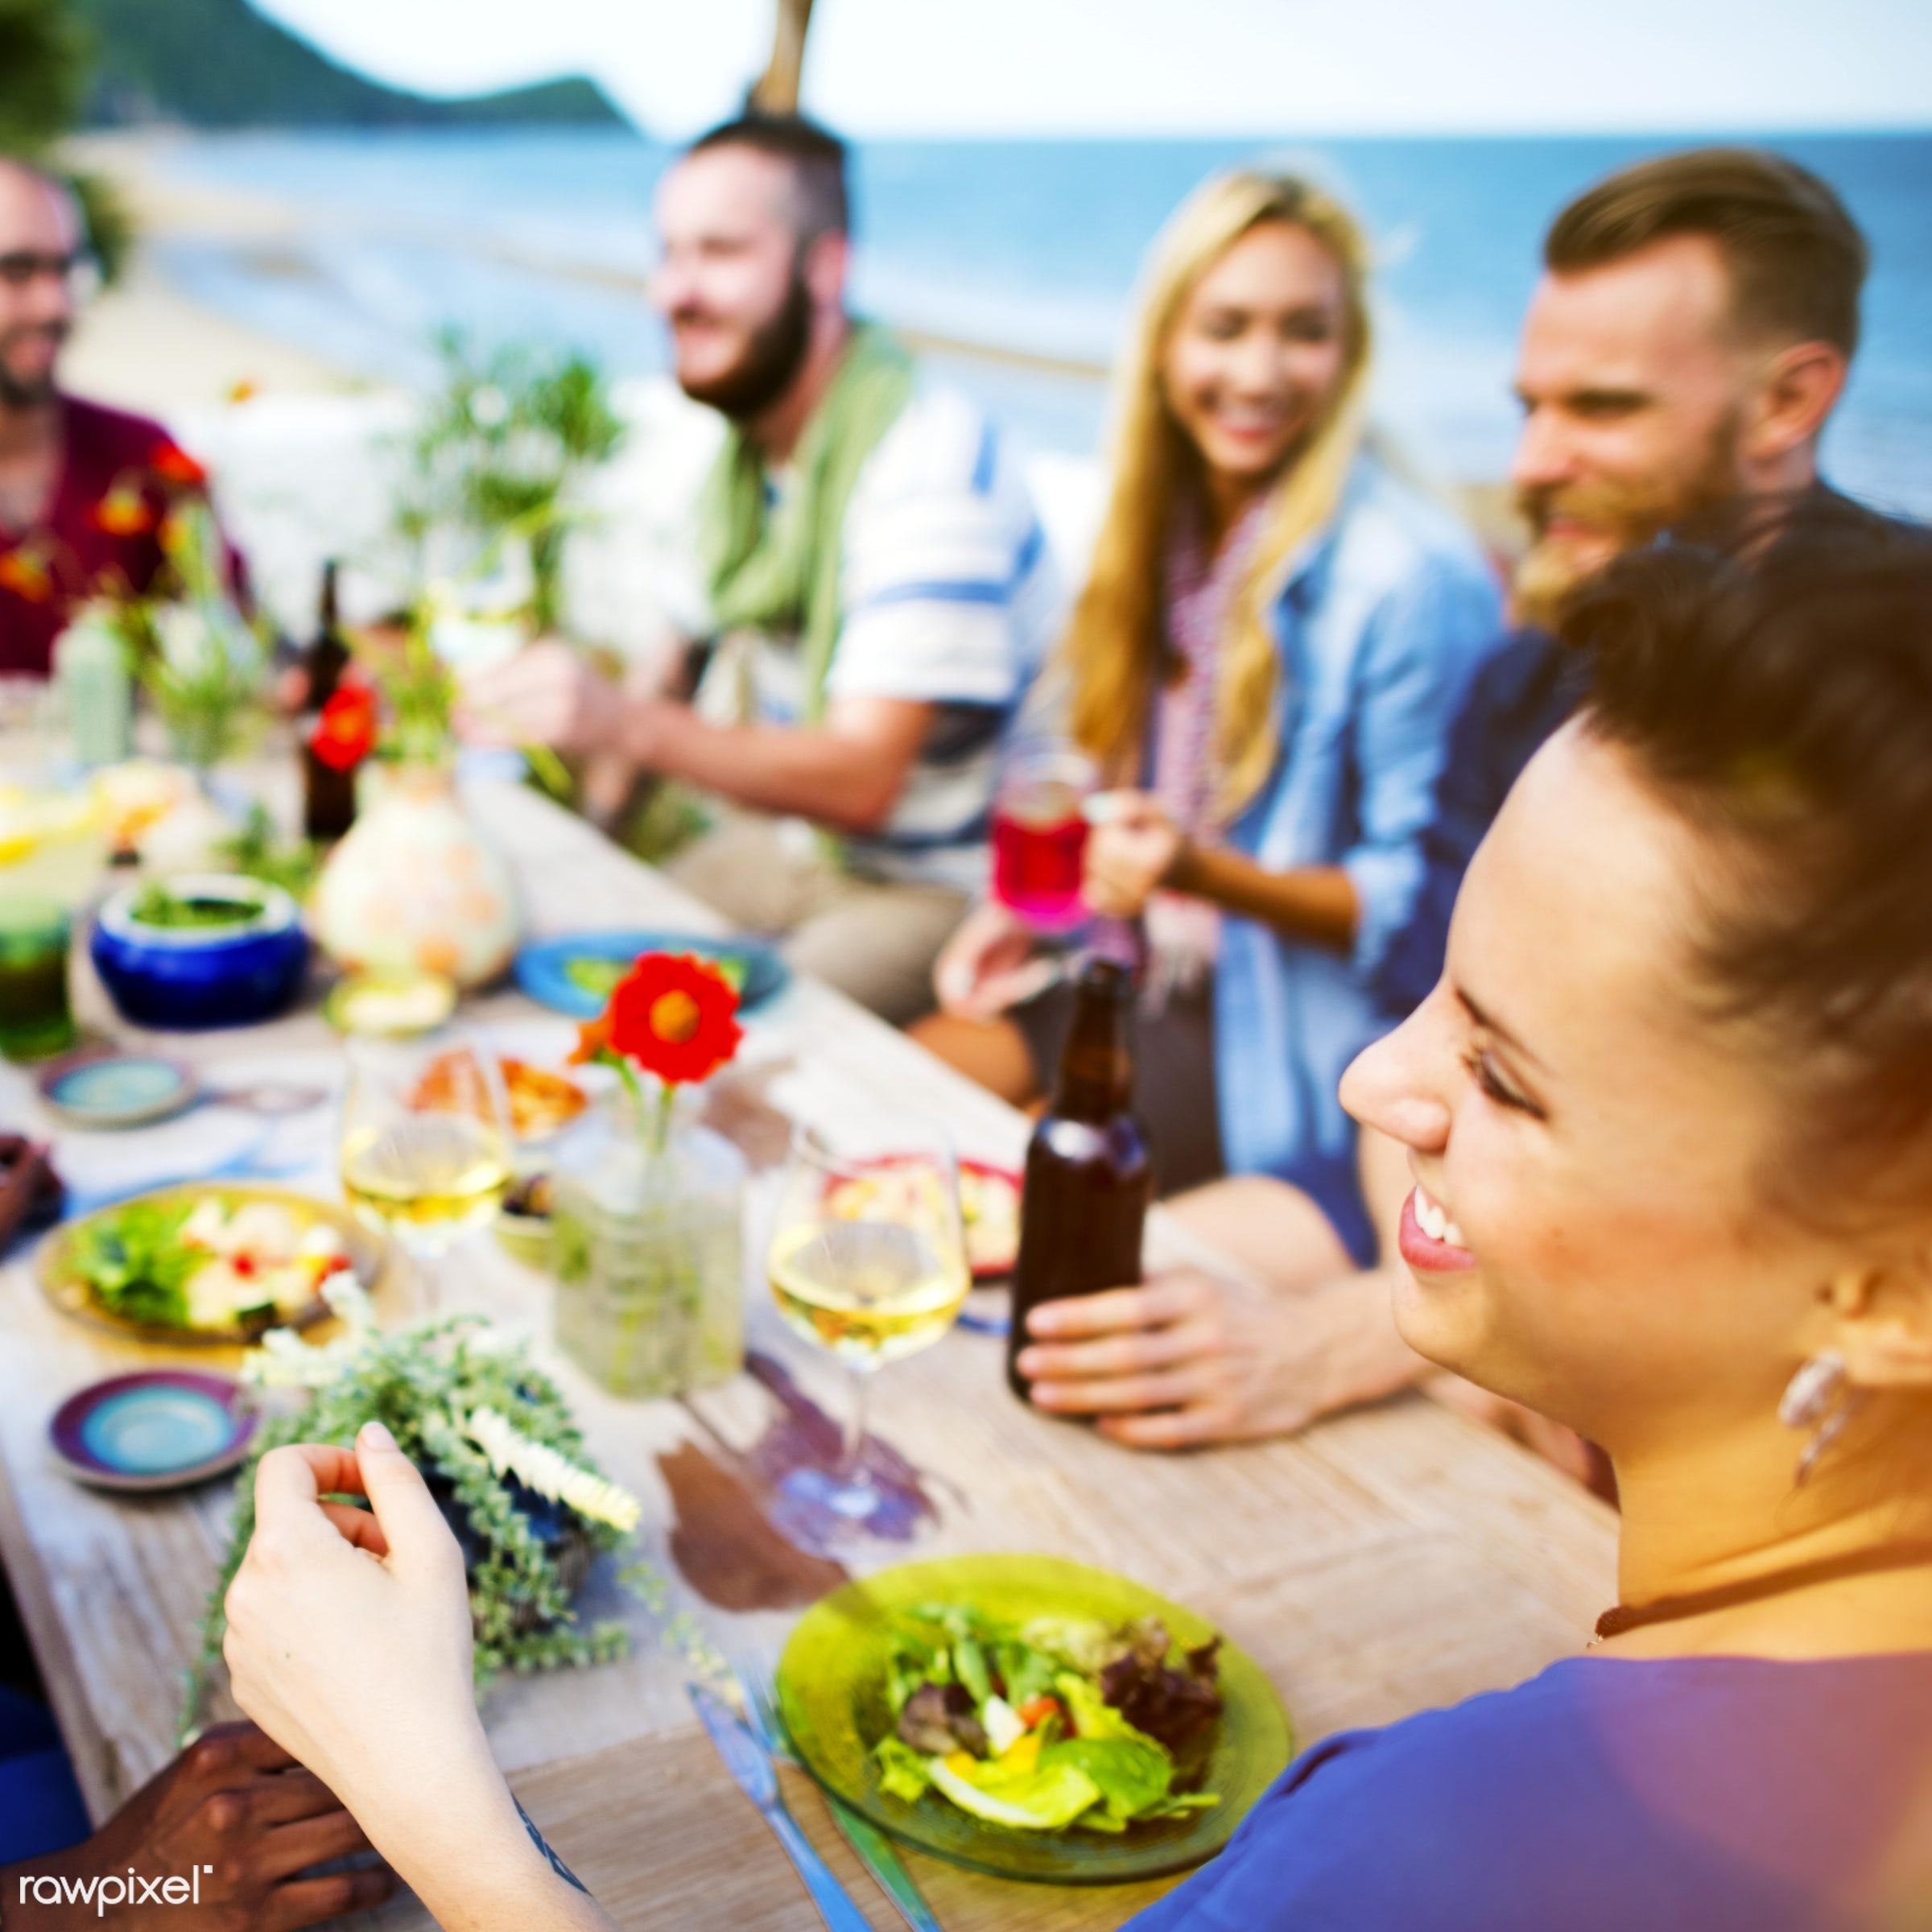 active, beach, beer, beverage, bonding, casual, celebration, cheerful, cheers, dinner, diversity, drink, drinking, event,...